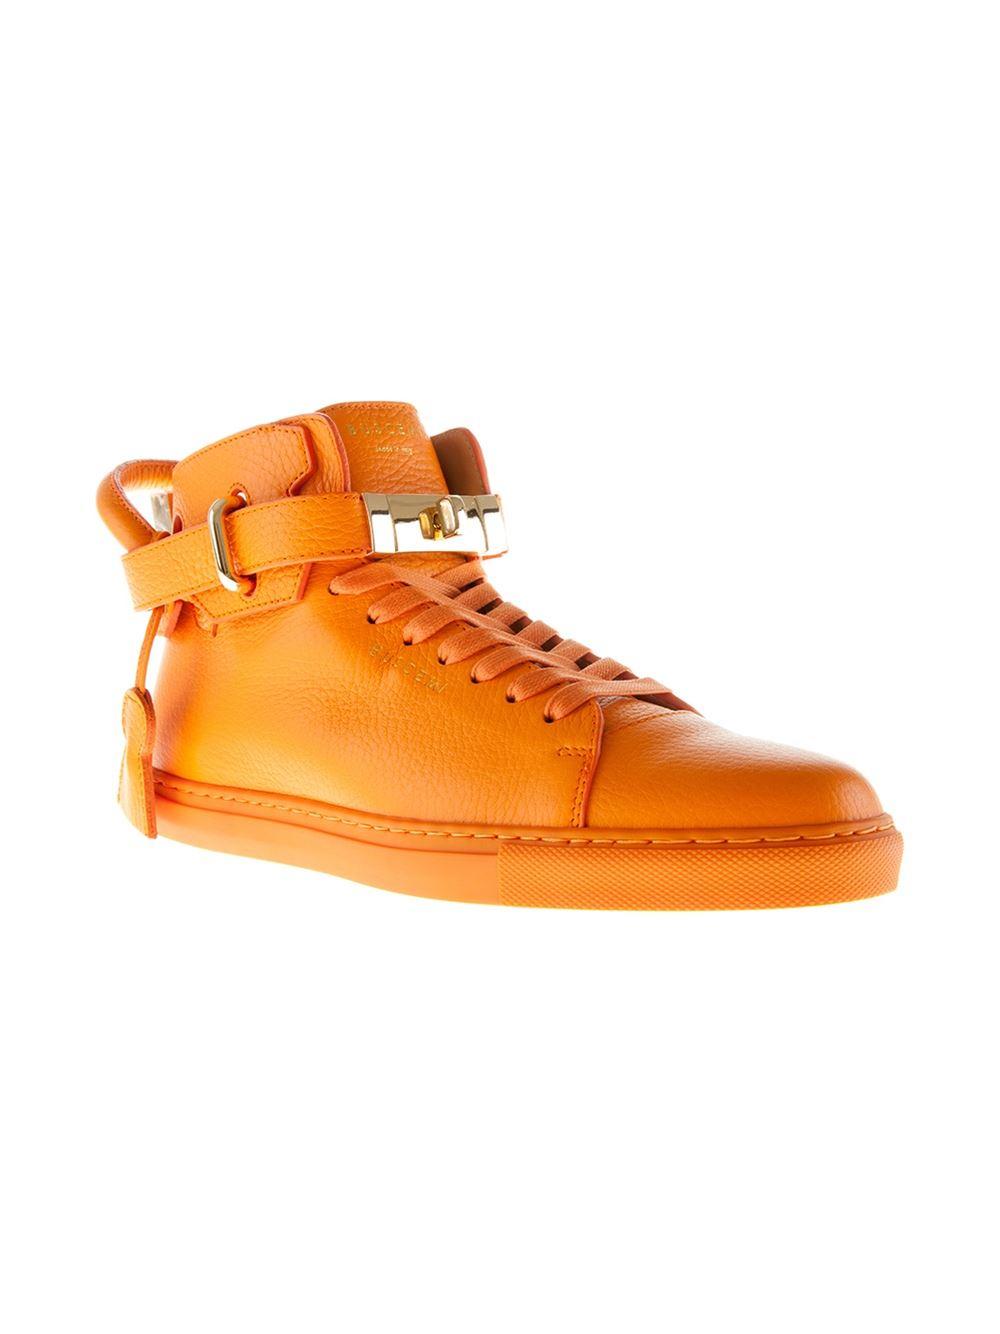 Buscemi 100mm Hitop Sneakers in Yellow